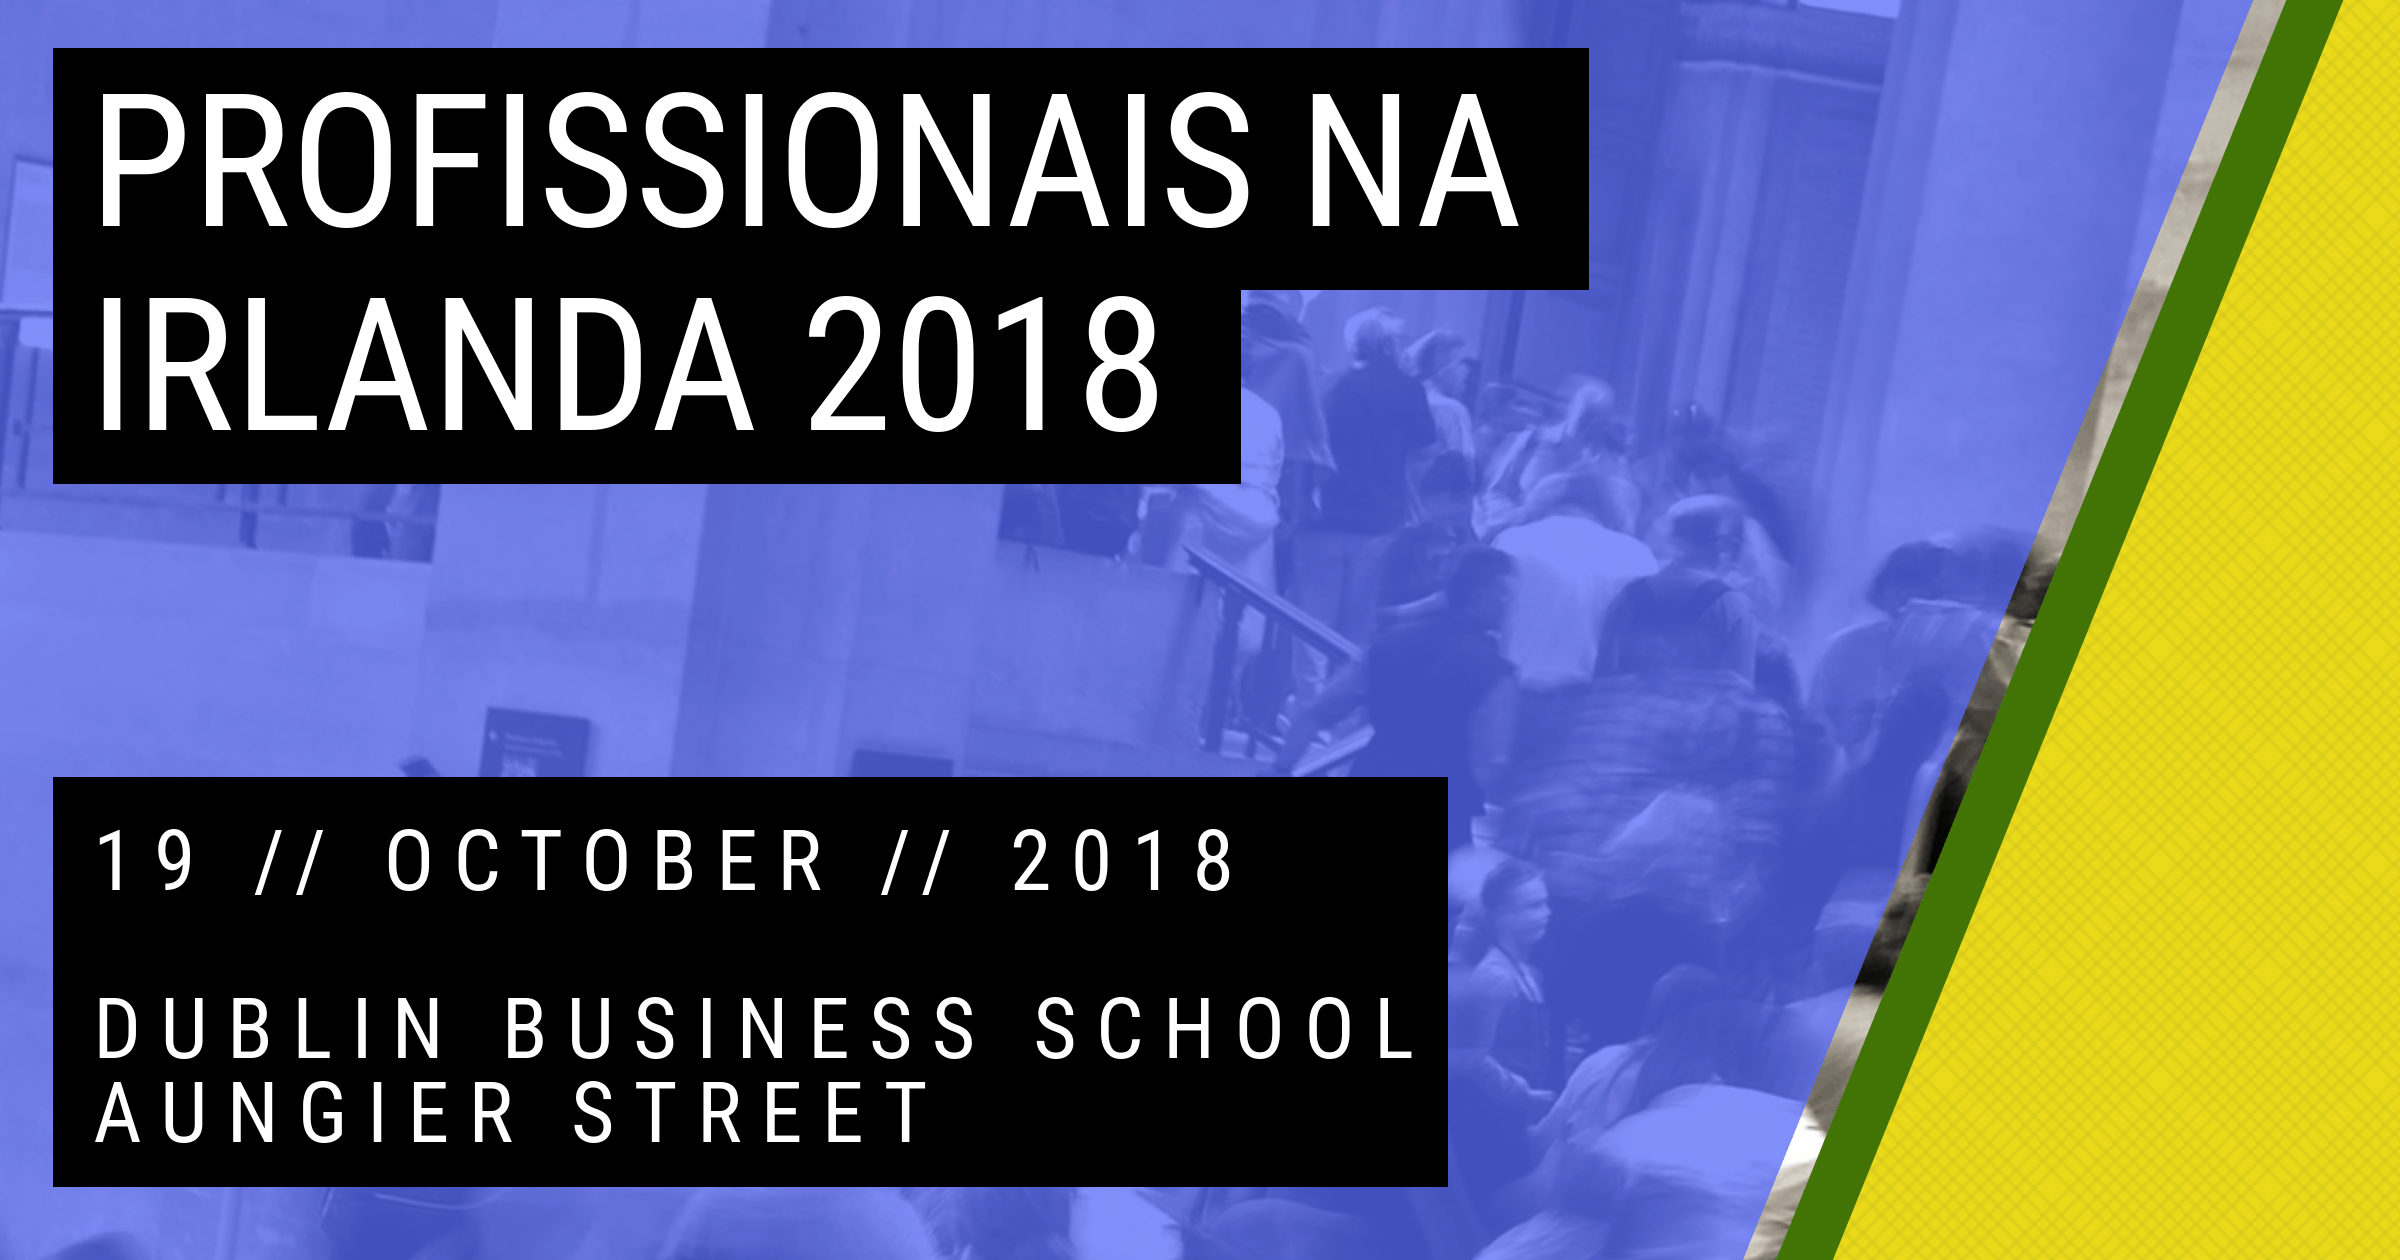 Profissionais na Irlanda 2018 - Brazilians in Ireland